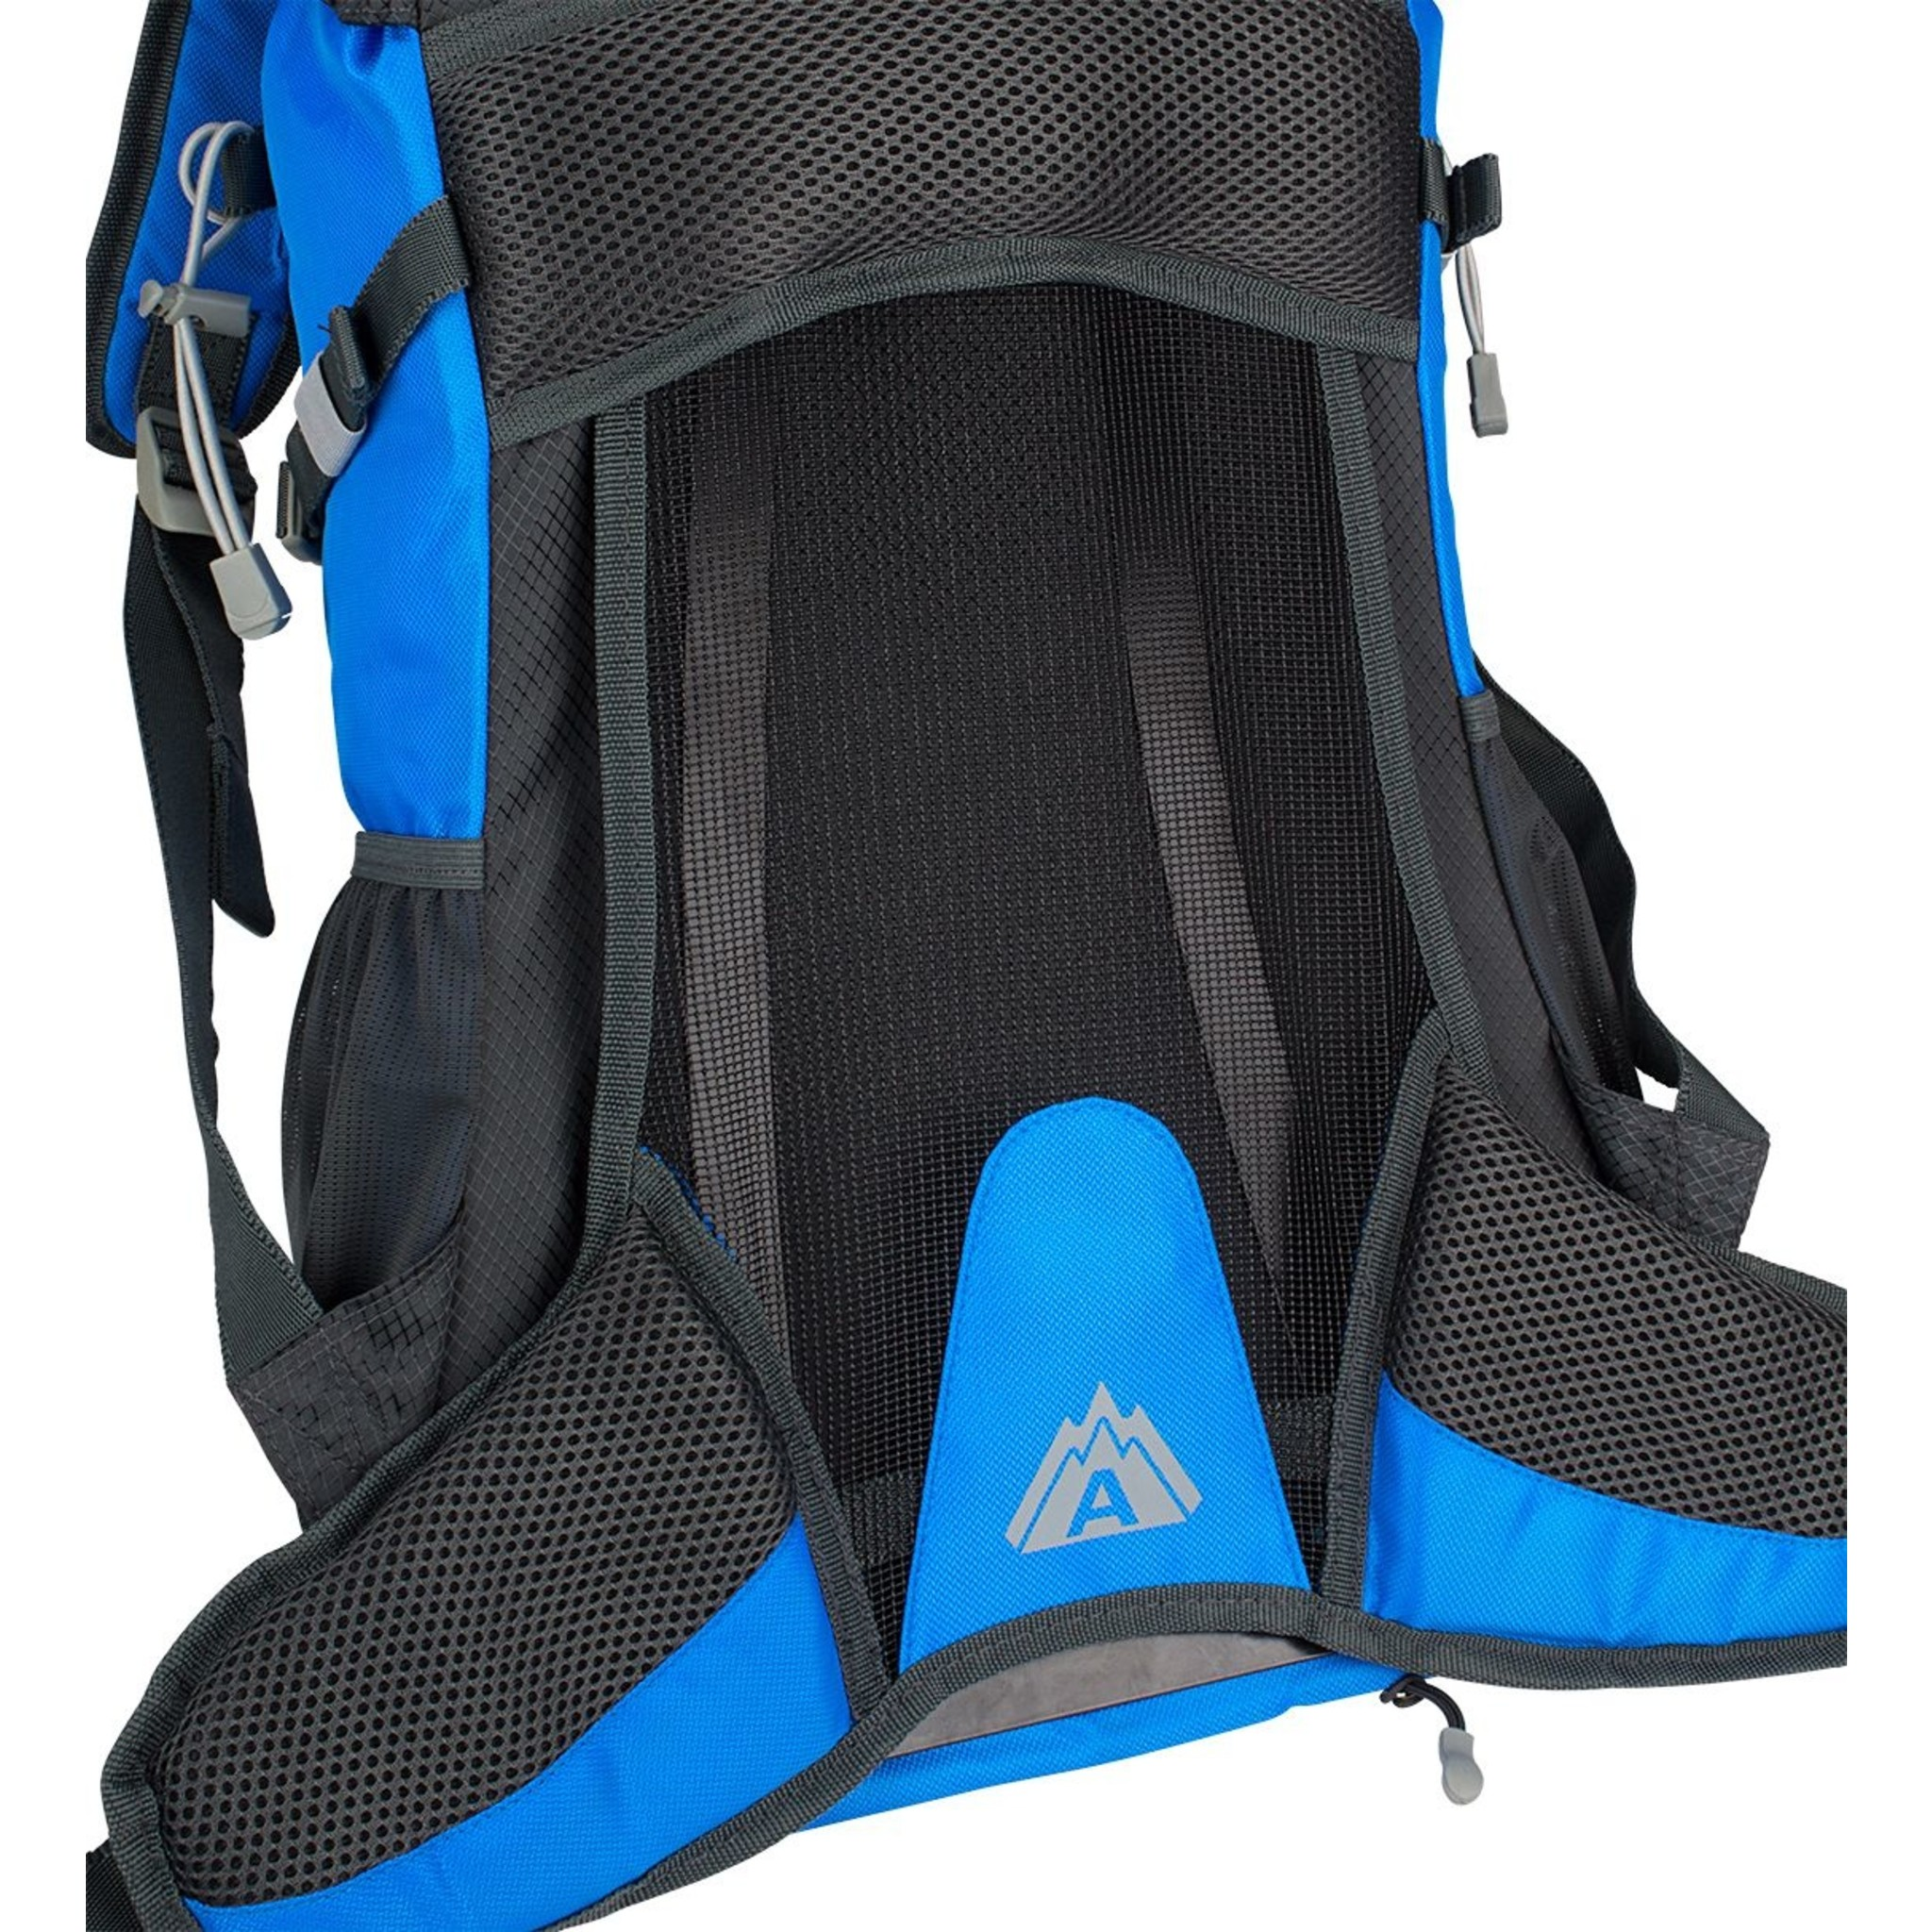 Abbey® Outdoor Rugzak Aero-fit Sphere - 35L